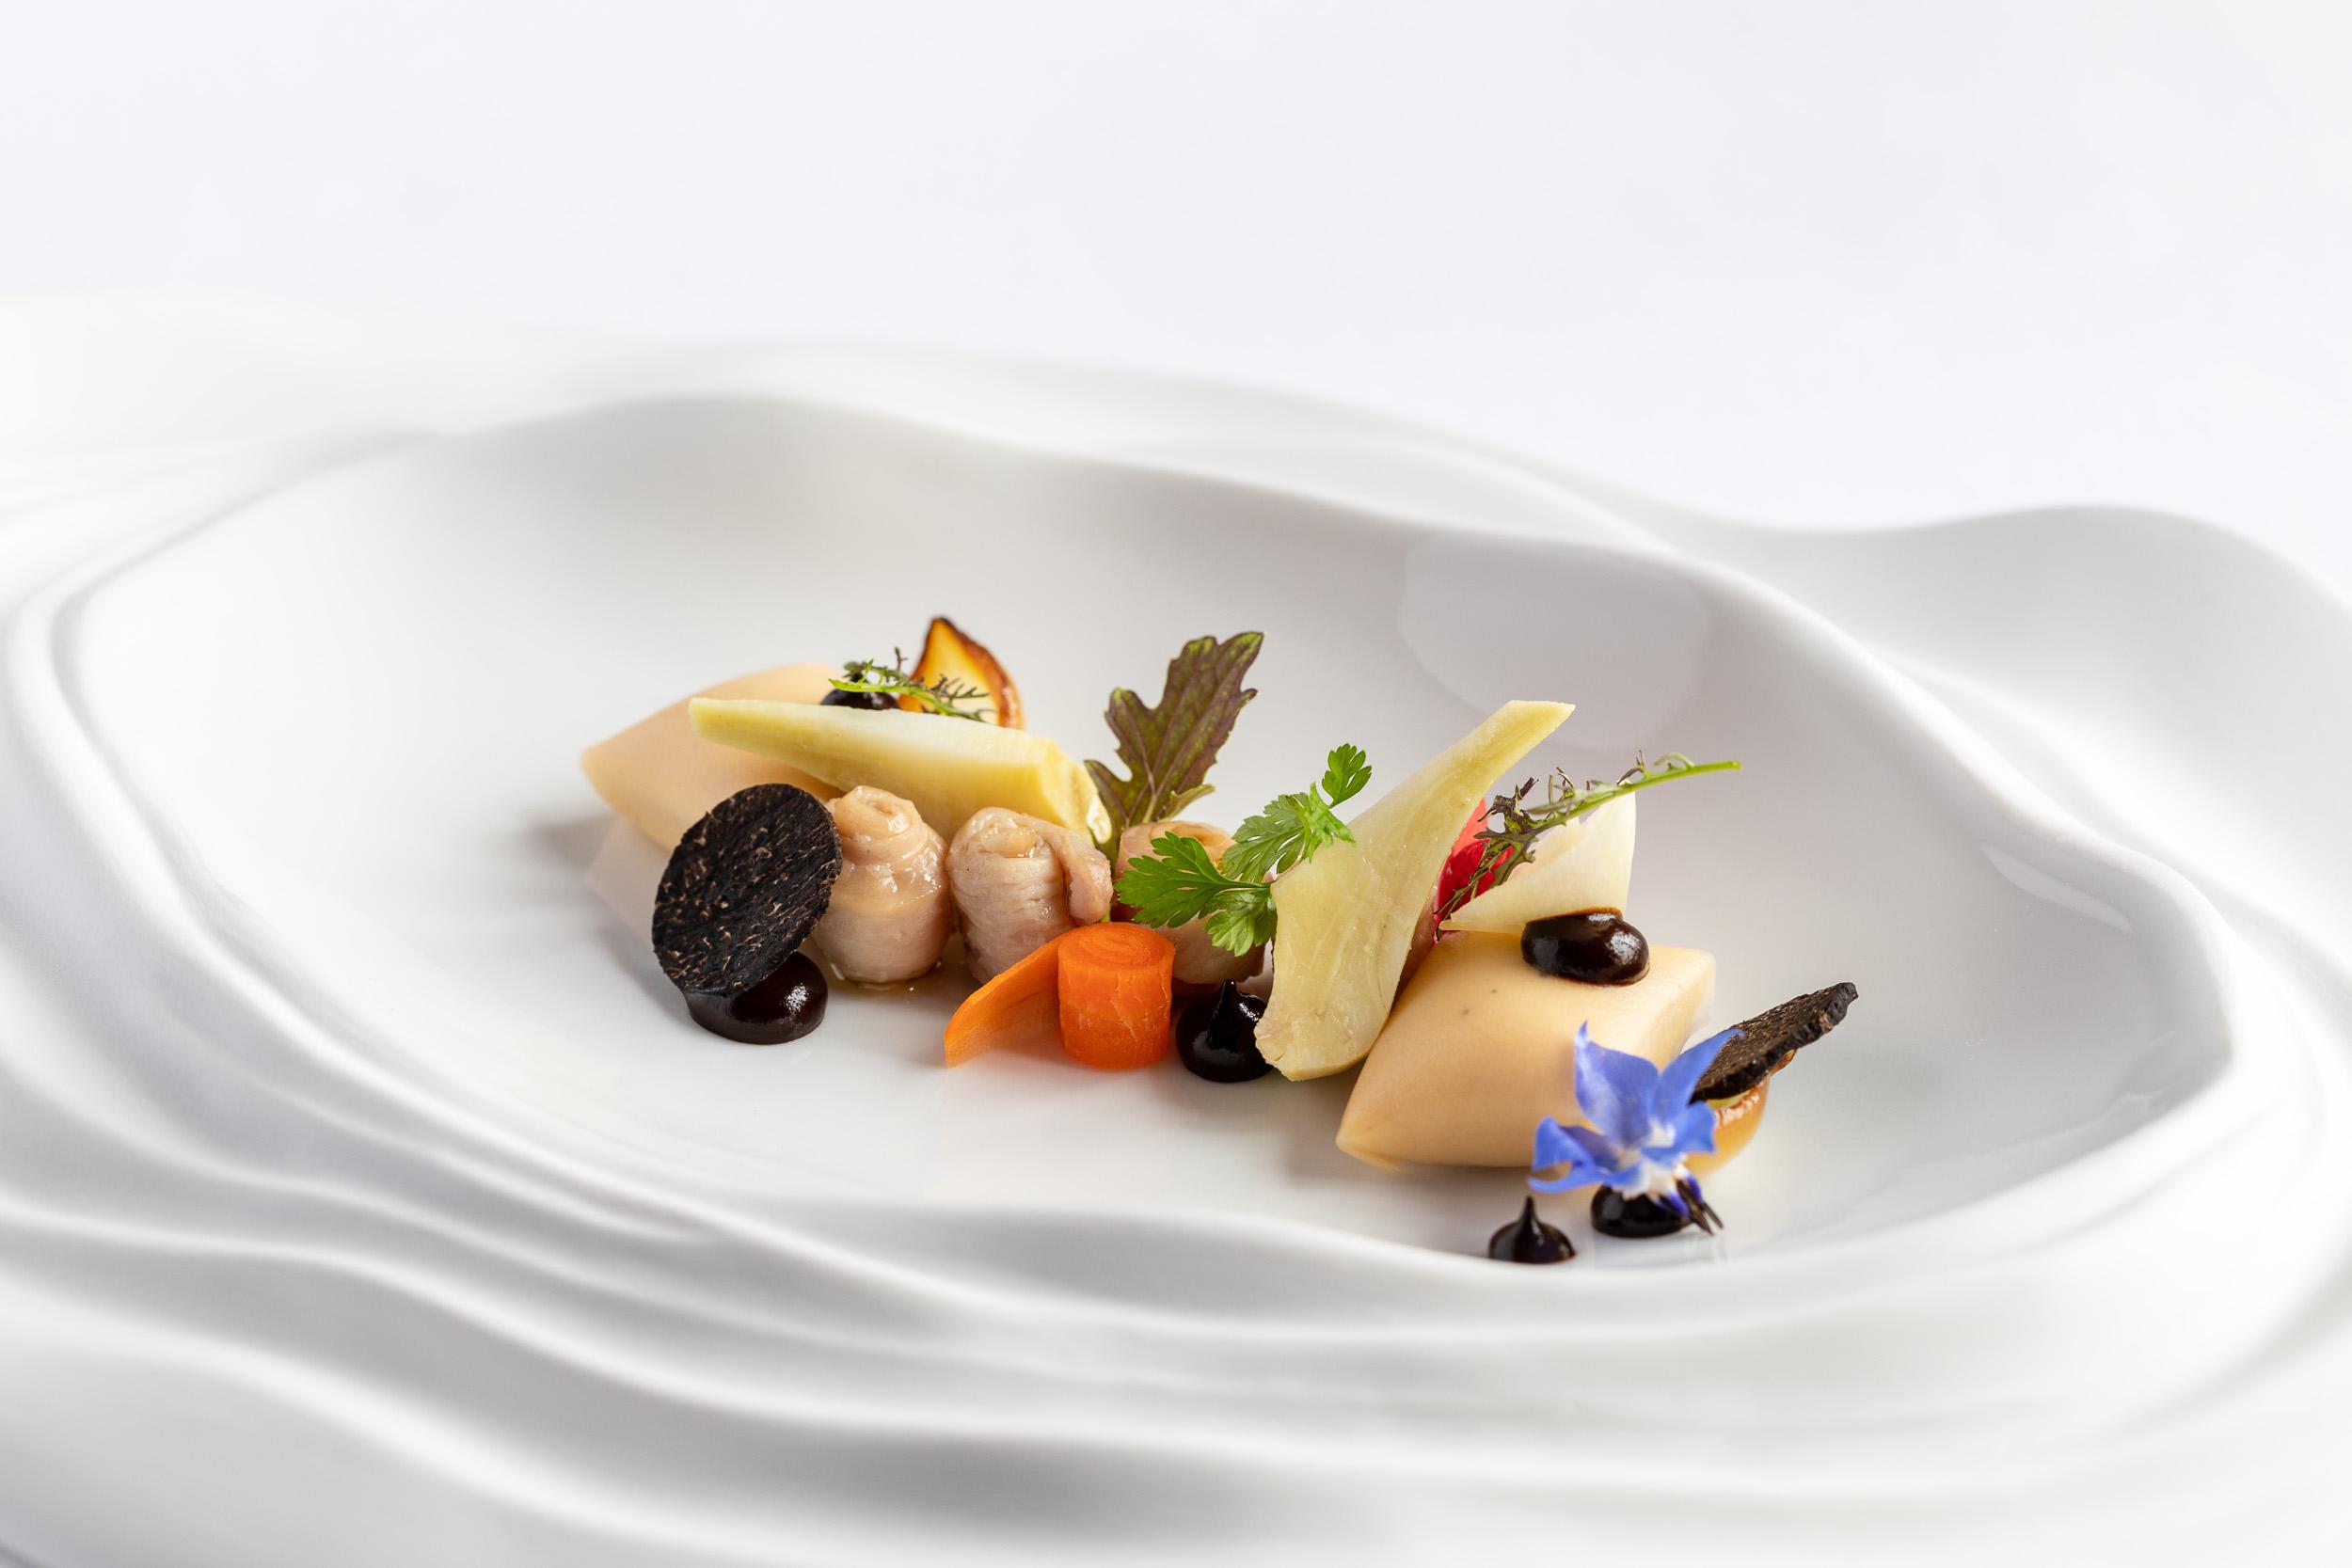 Food Photography at Casa Da Calcada Hotel, Portugal